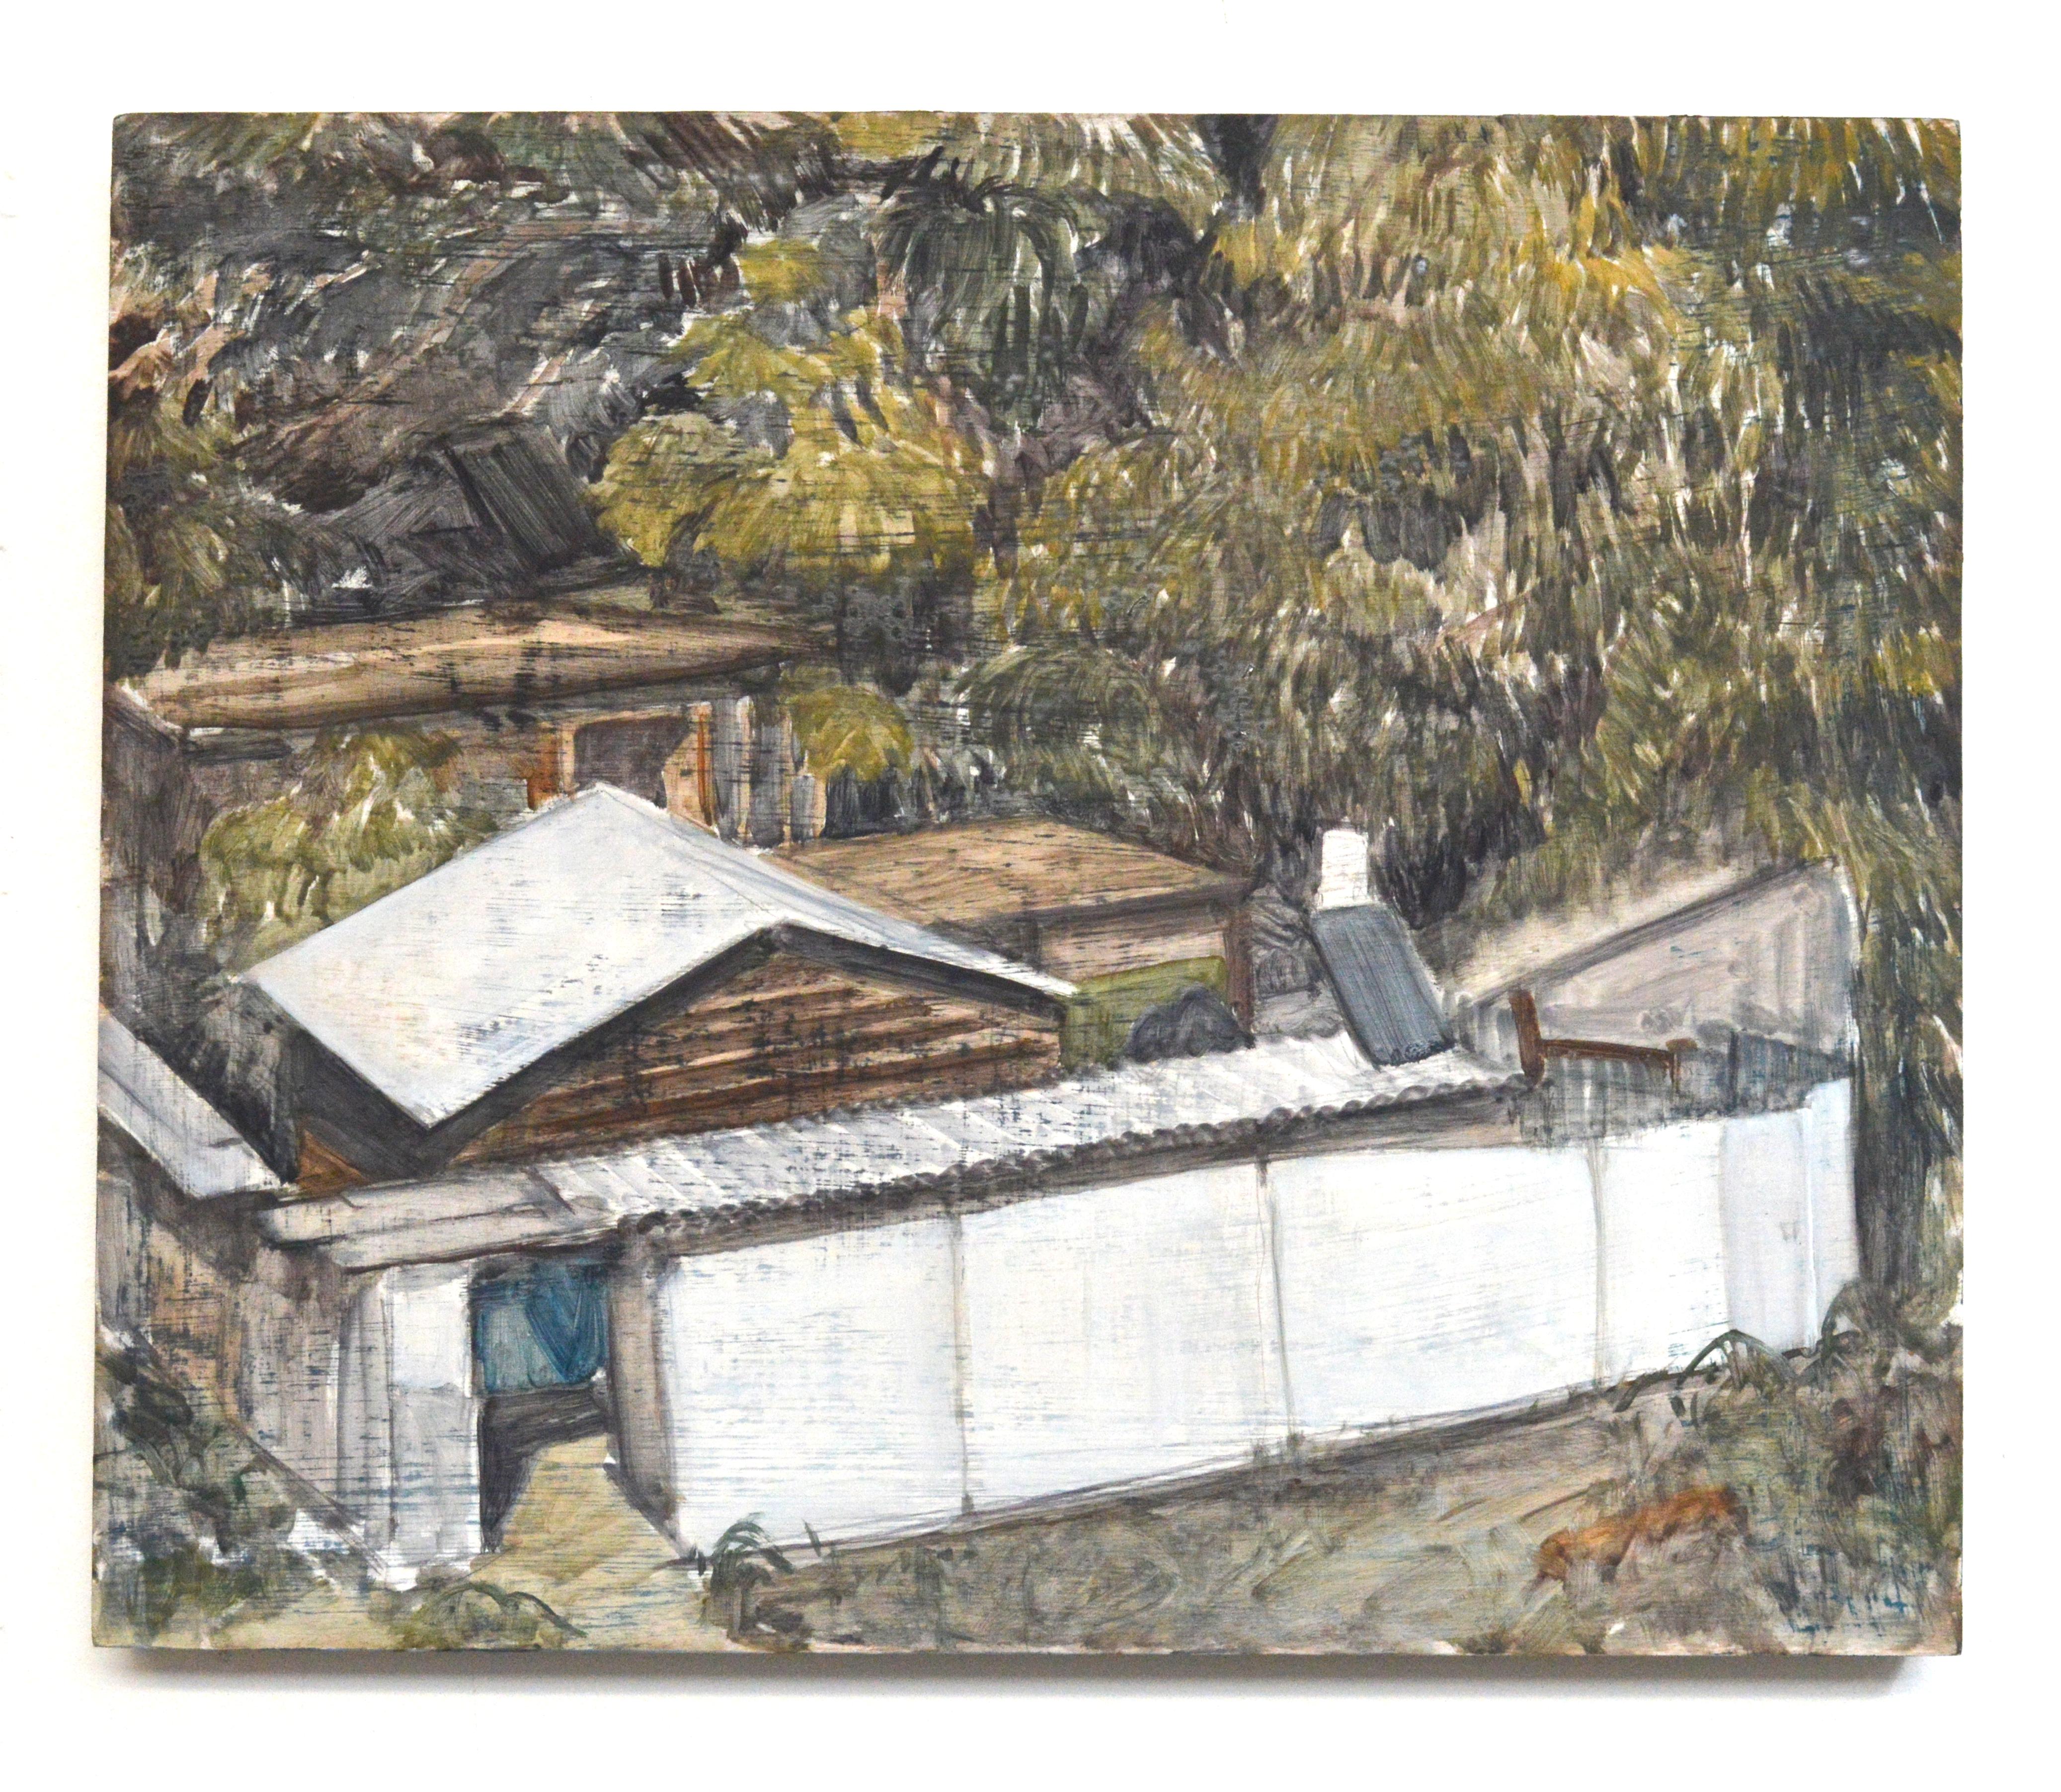 Haargazim, 2018, 38 x 46 cm, oil on wood